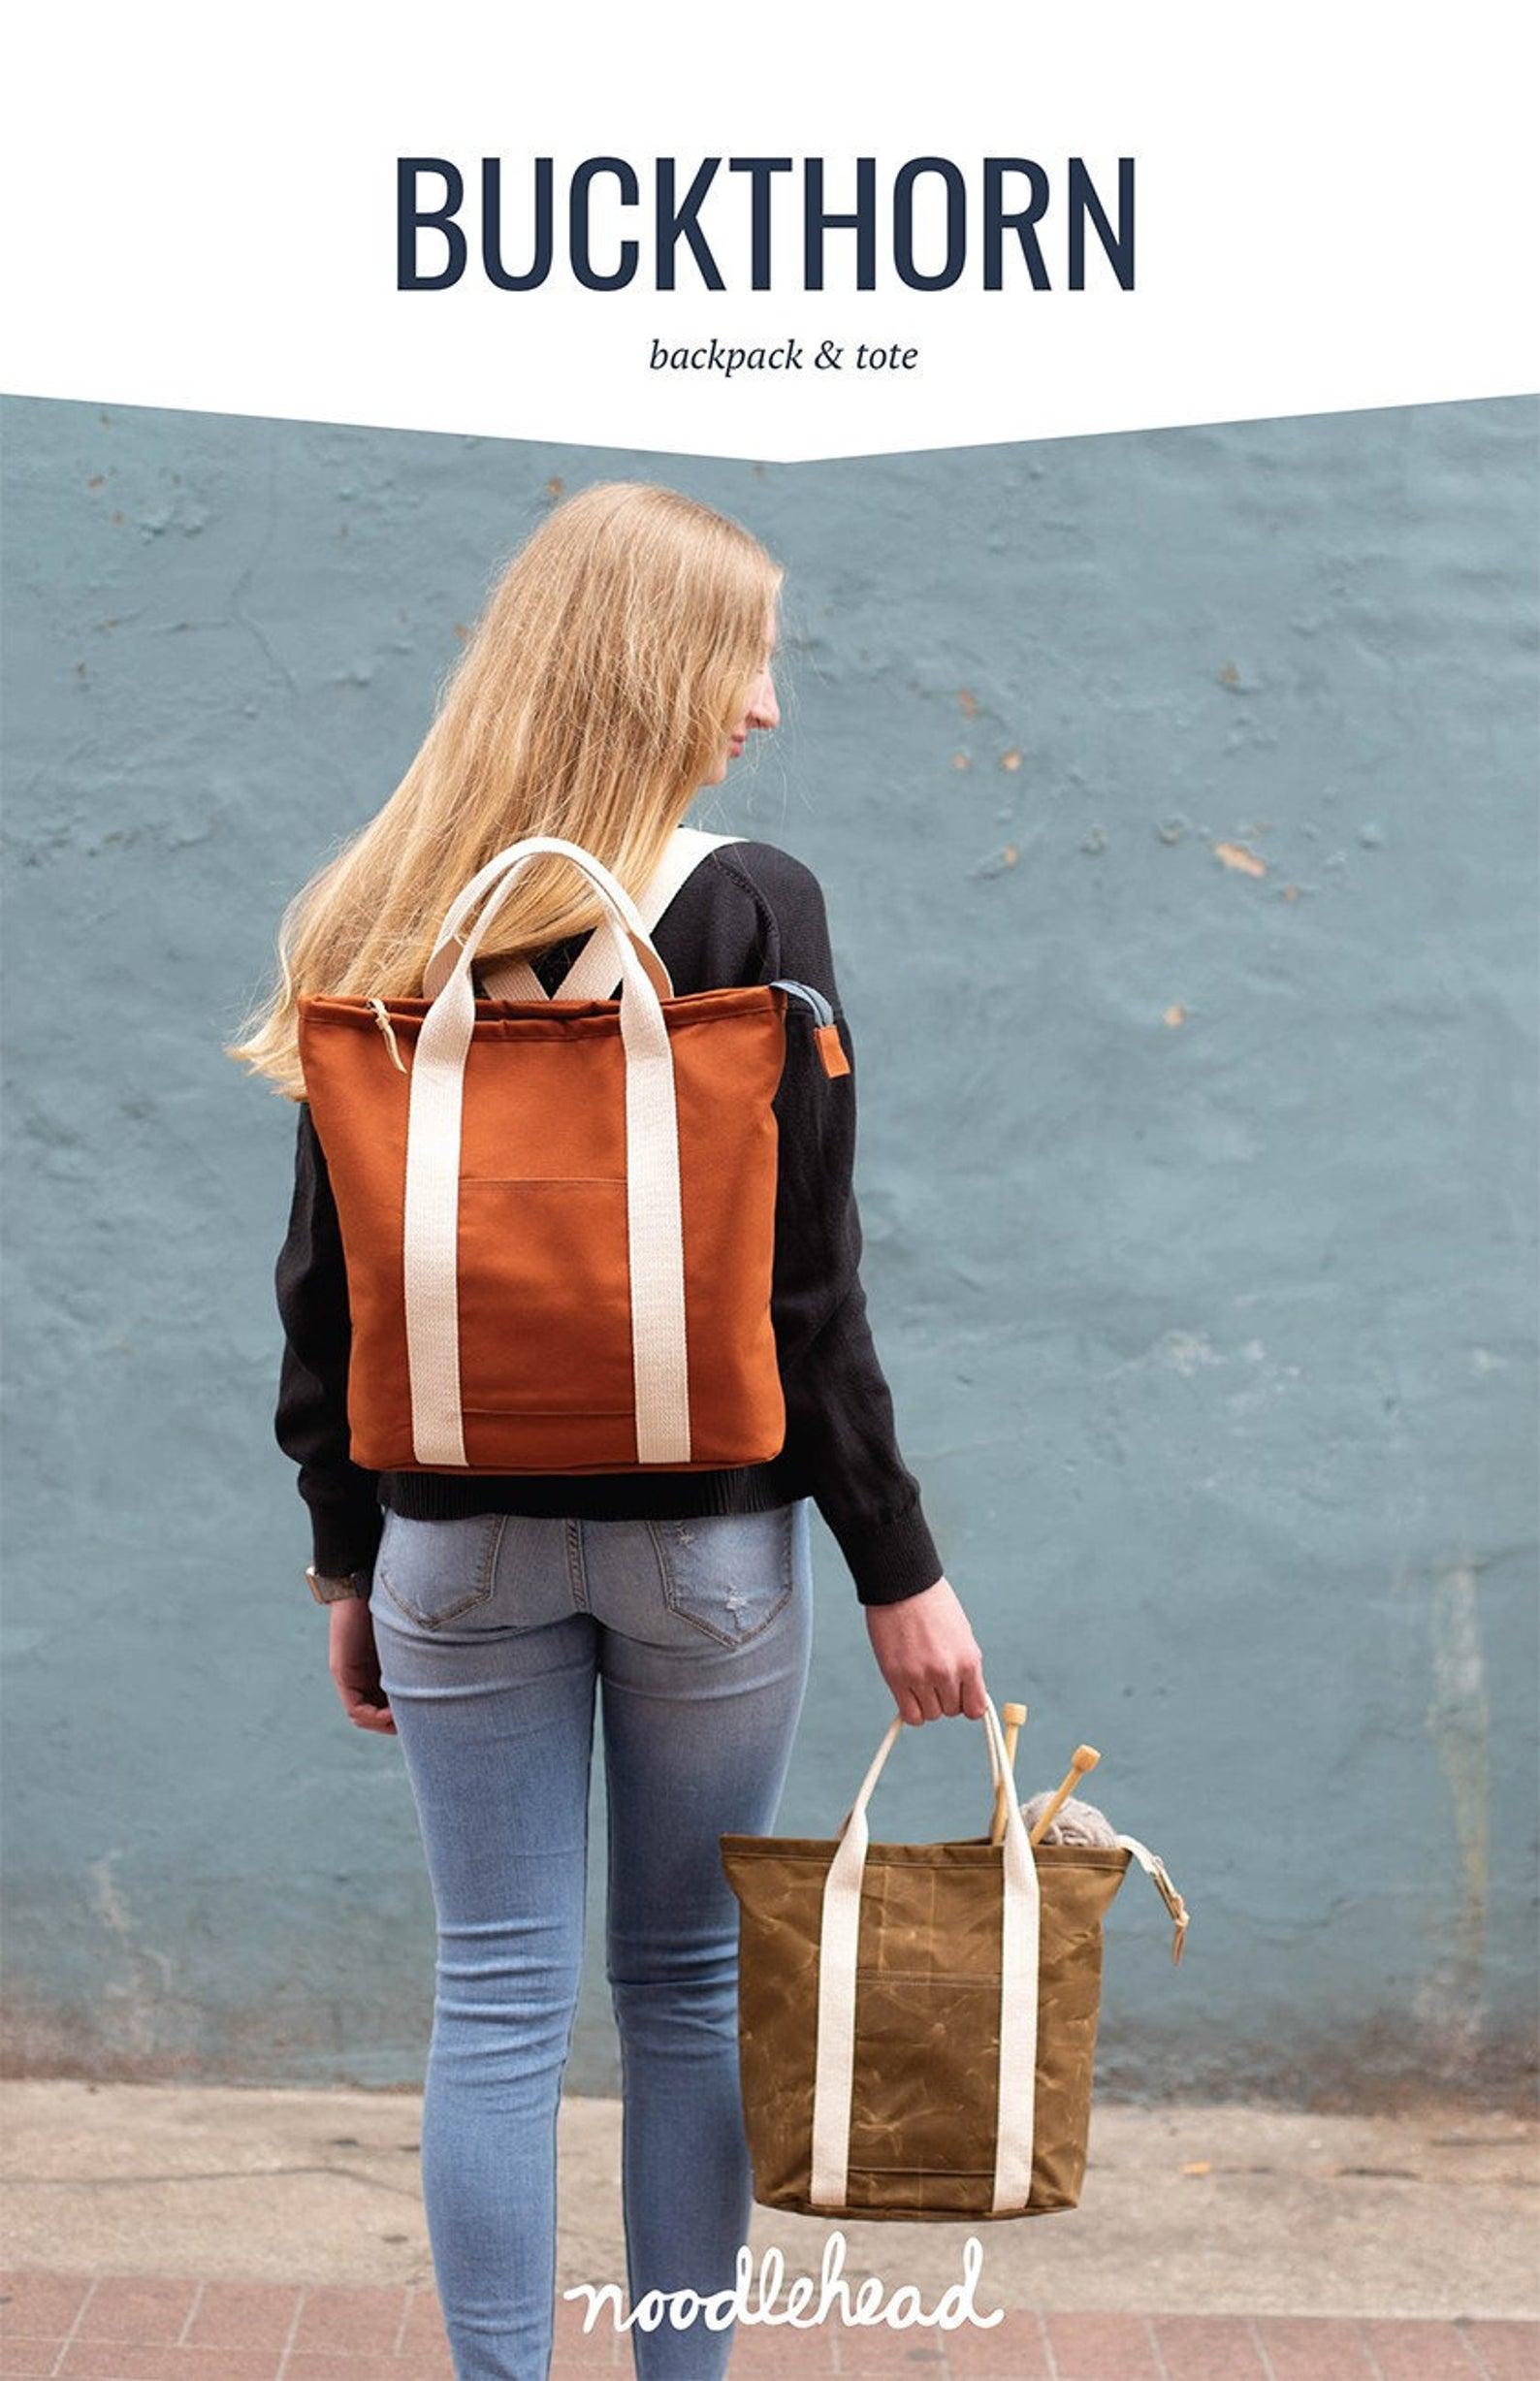 Noodlehead Buckthorn Backpack & Tote Pattern